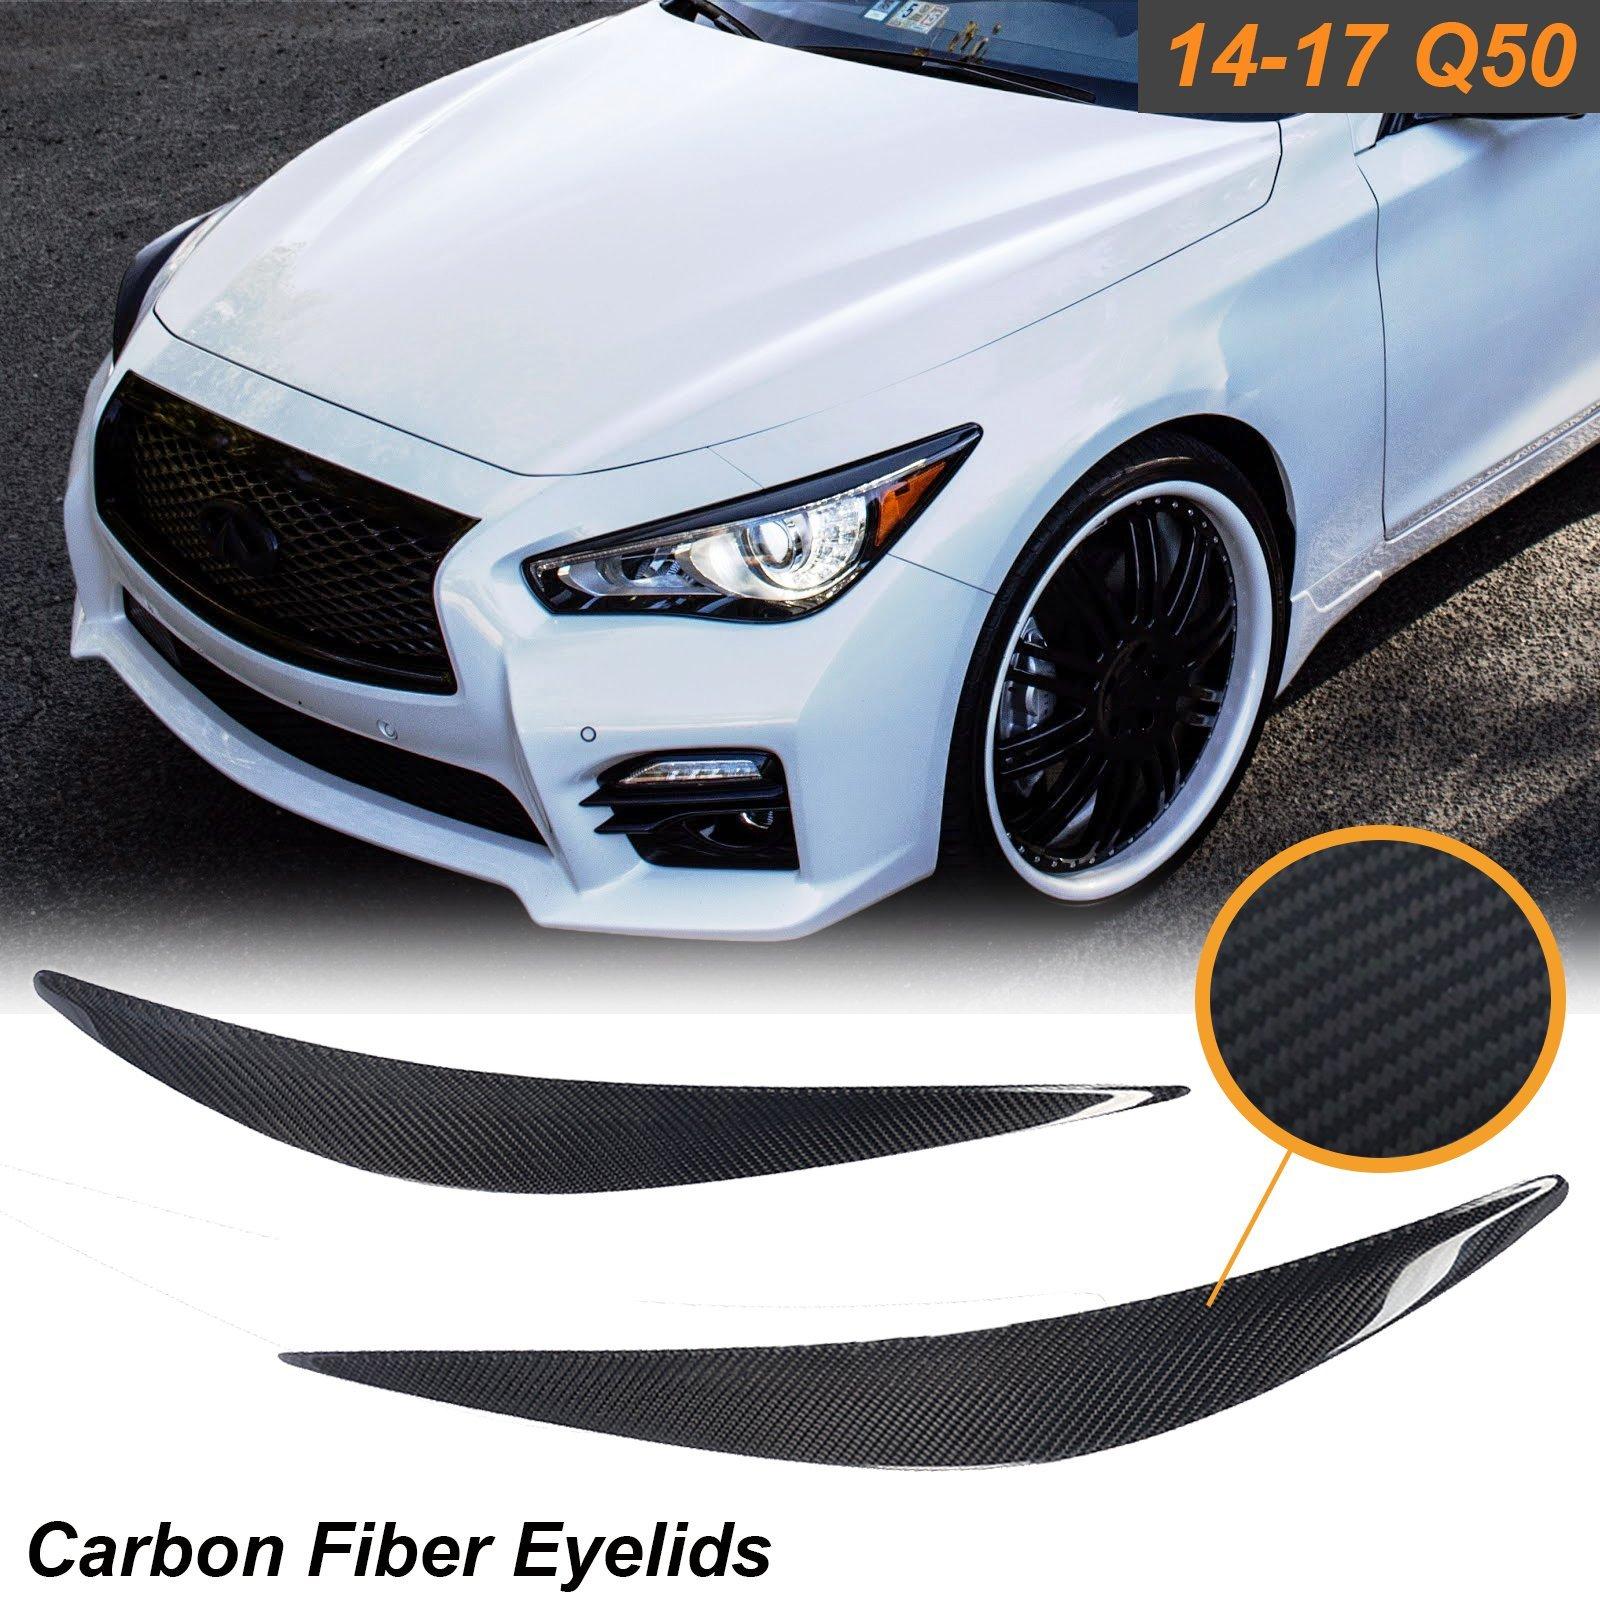 1 Set Carbon Fiber Eyelid Covers Headlight Eyebrow Lids Fit Infiniti Q50 2014-2017